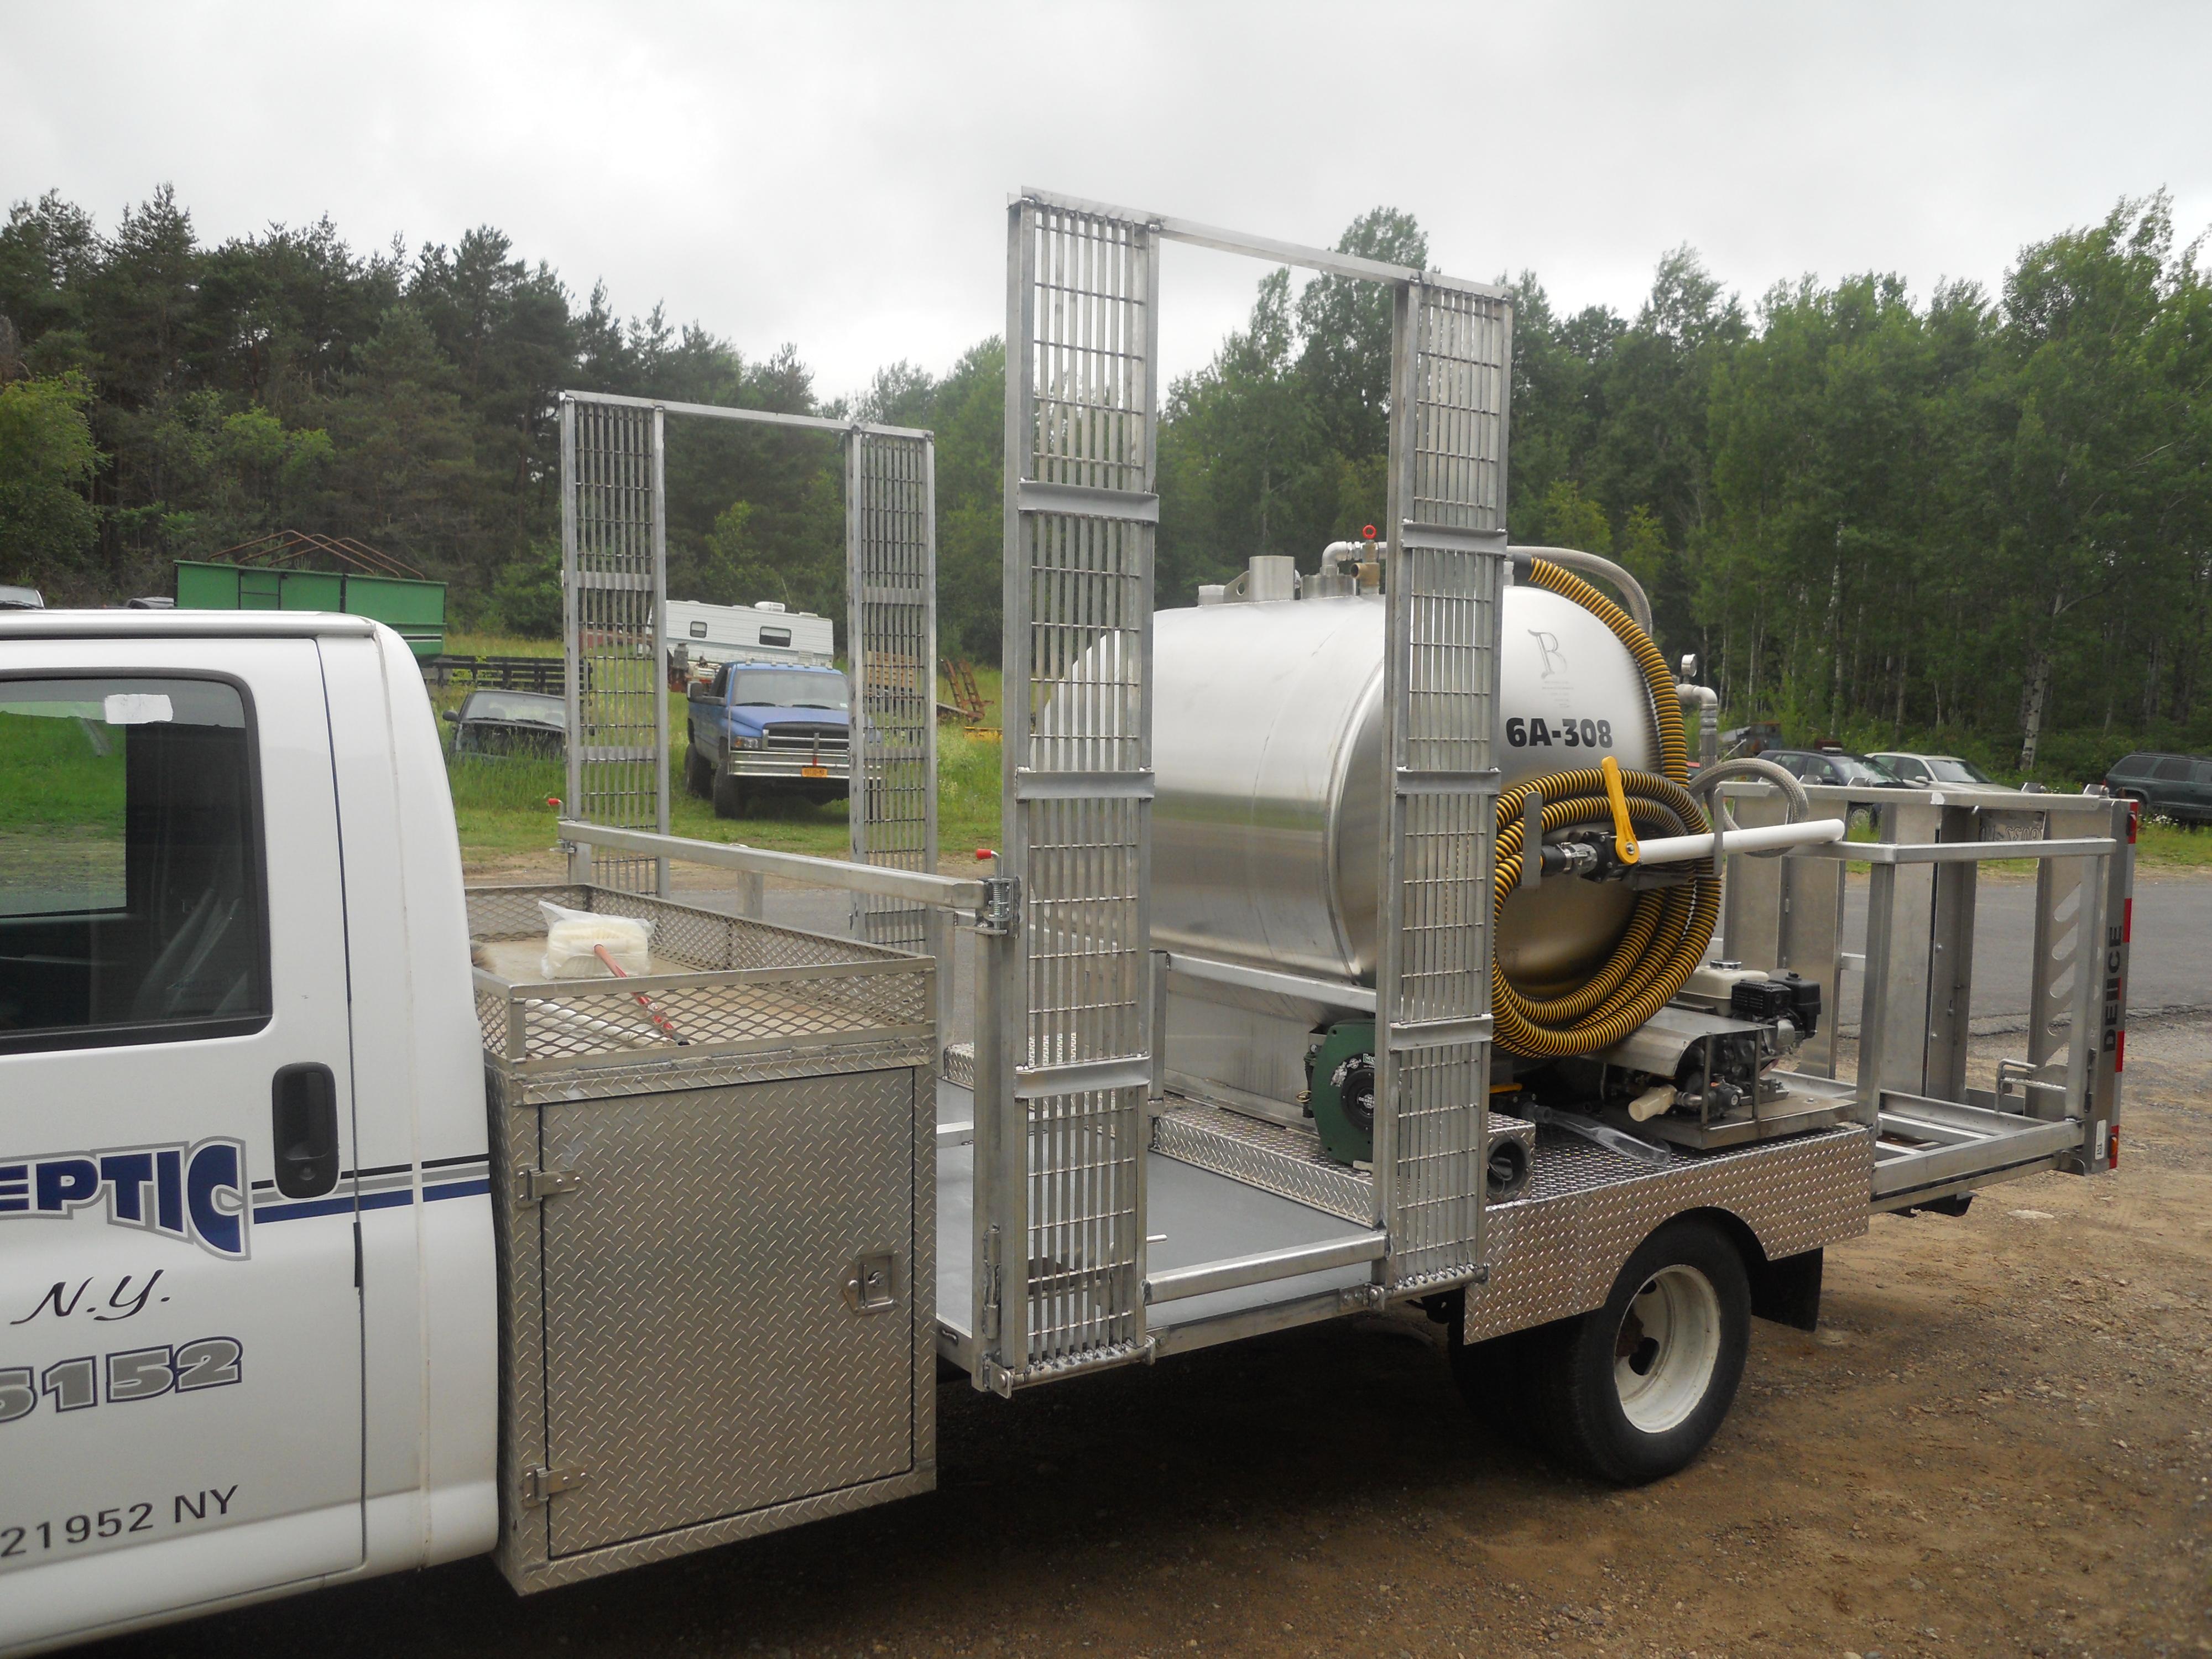 Portable Sanitation Services : Aj s septic portable toilet service truck hebel welding